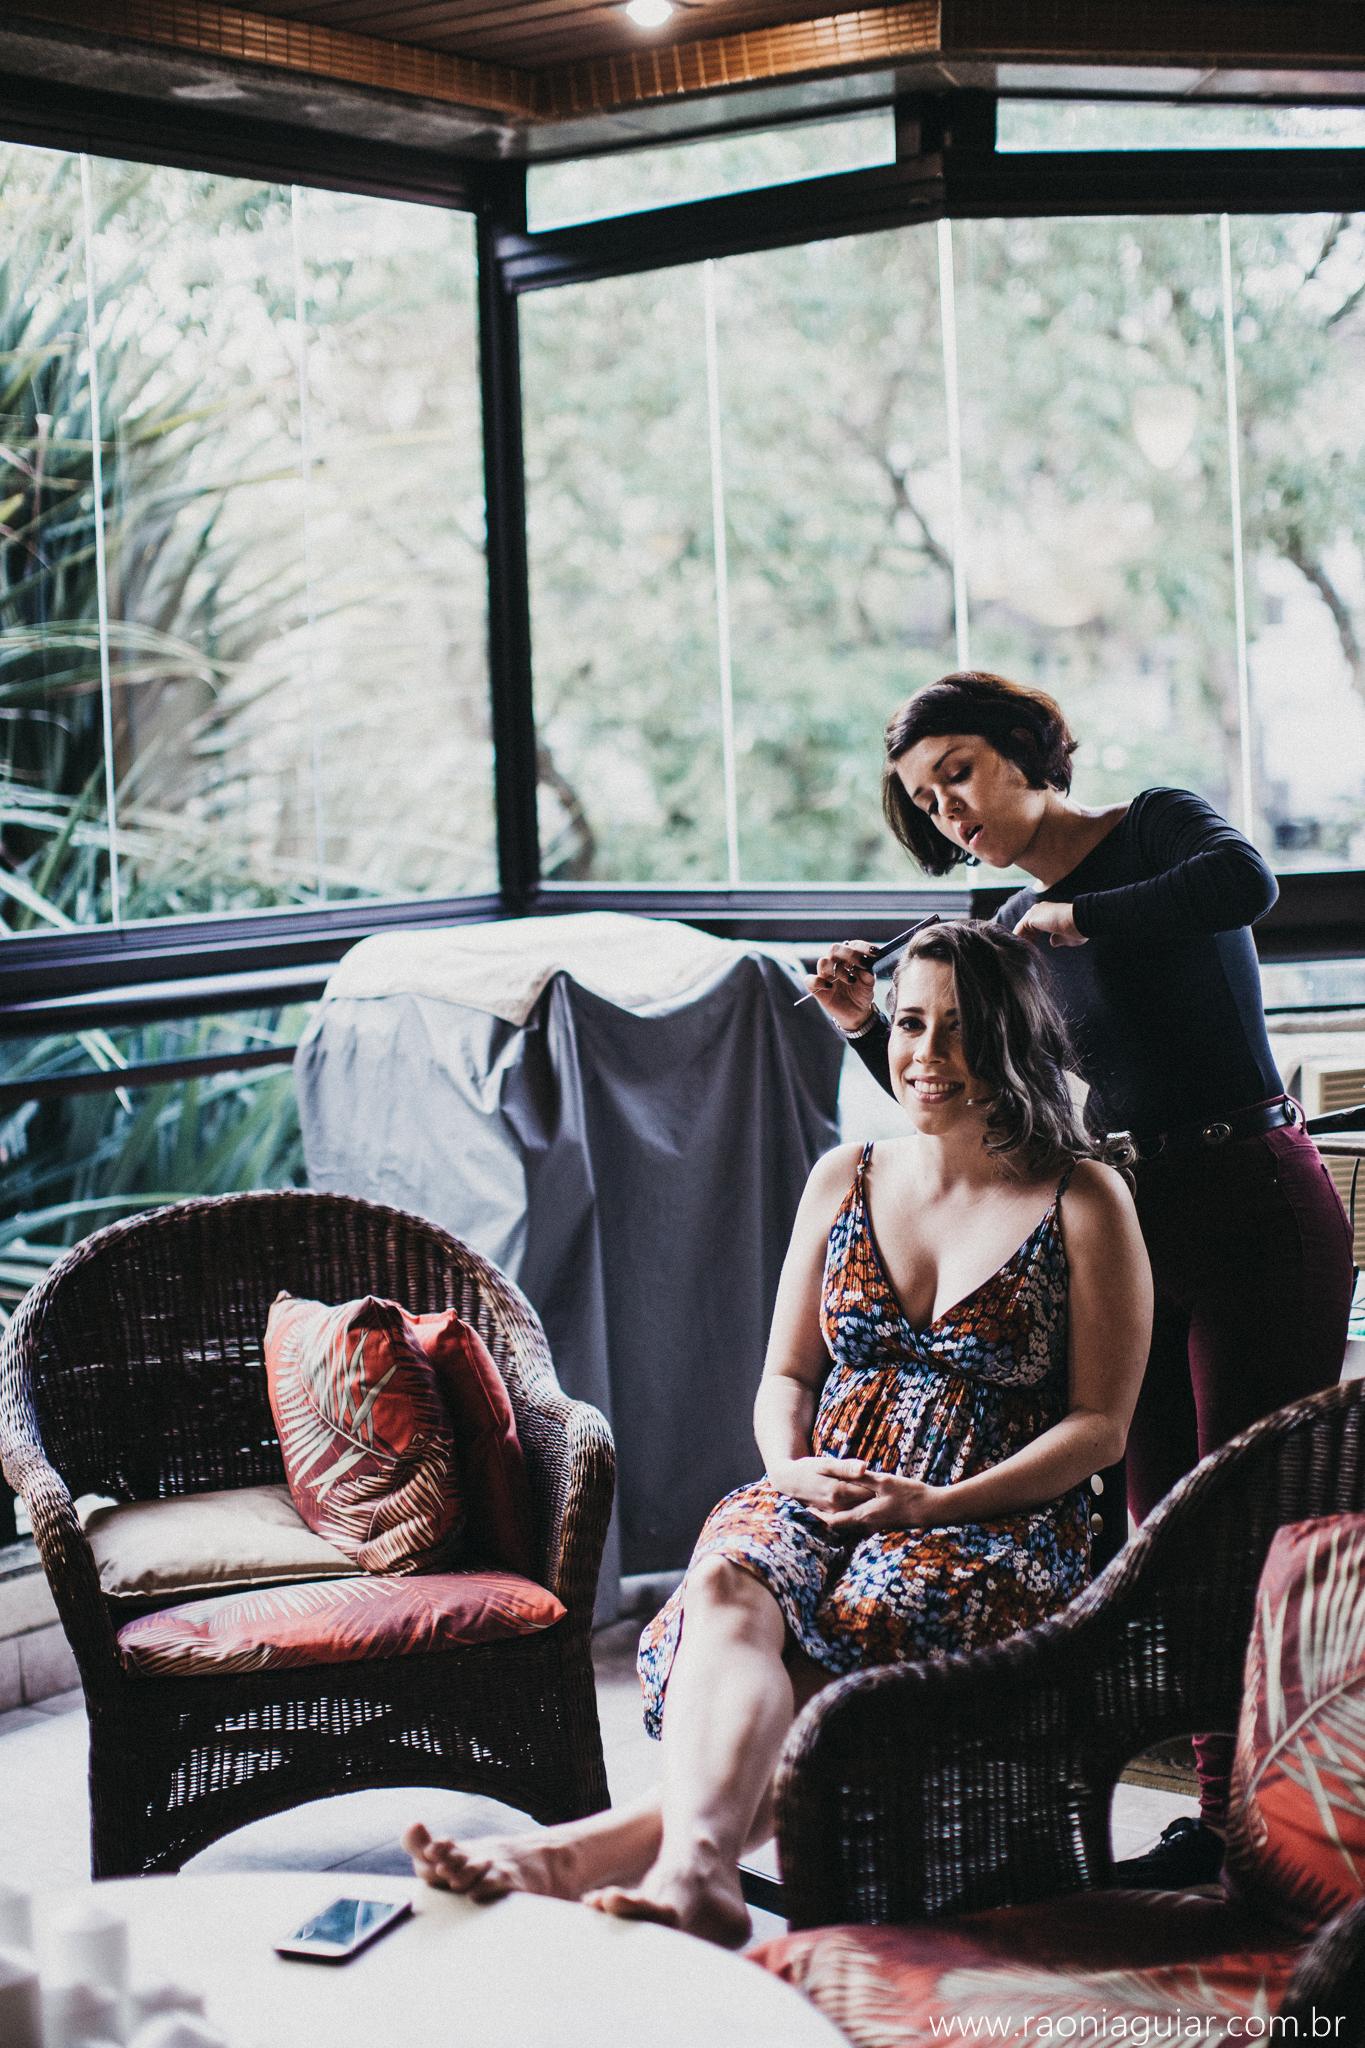 2018.10 Casamento Rebeca Soares e Felipe 0025.jpg